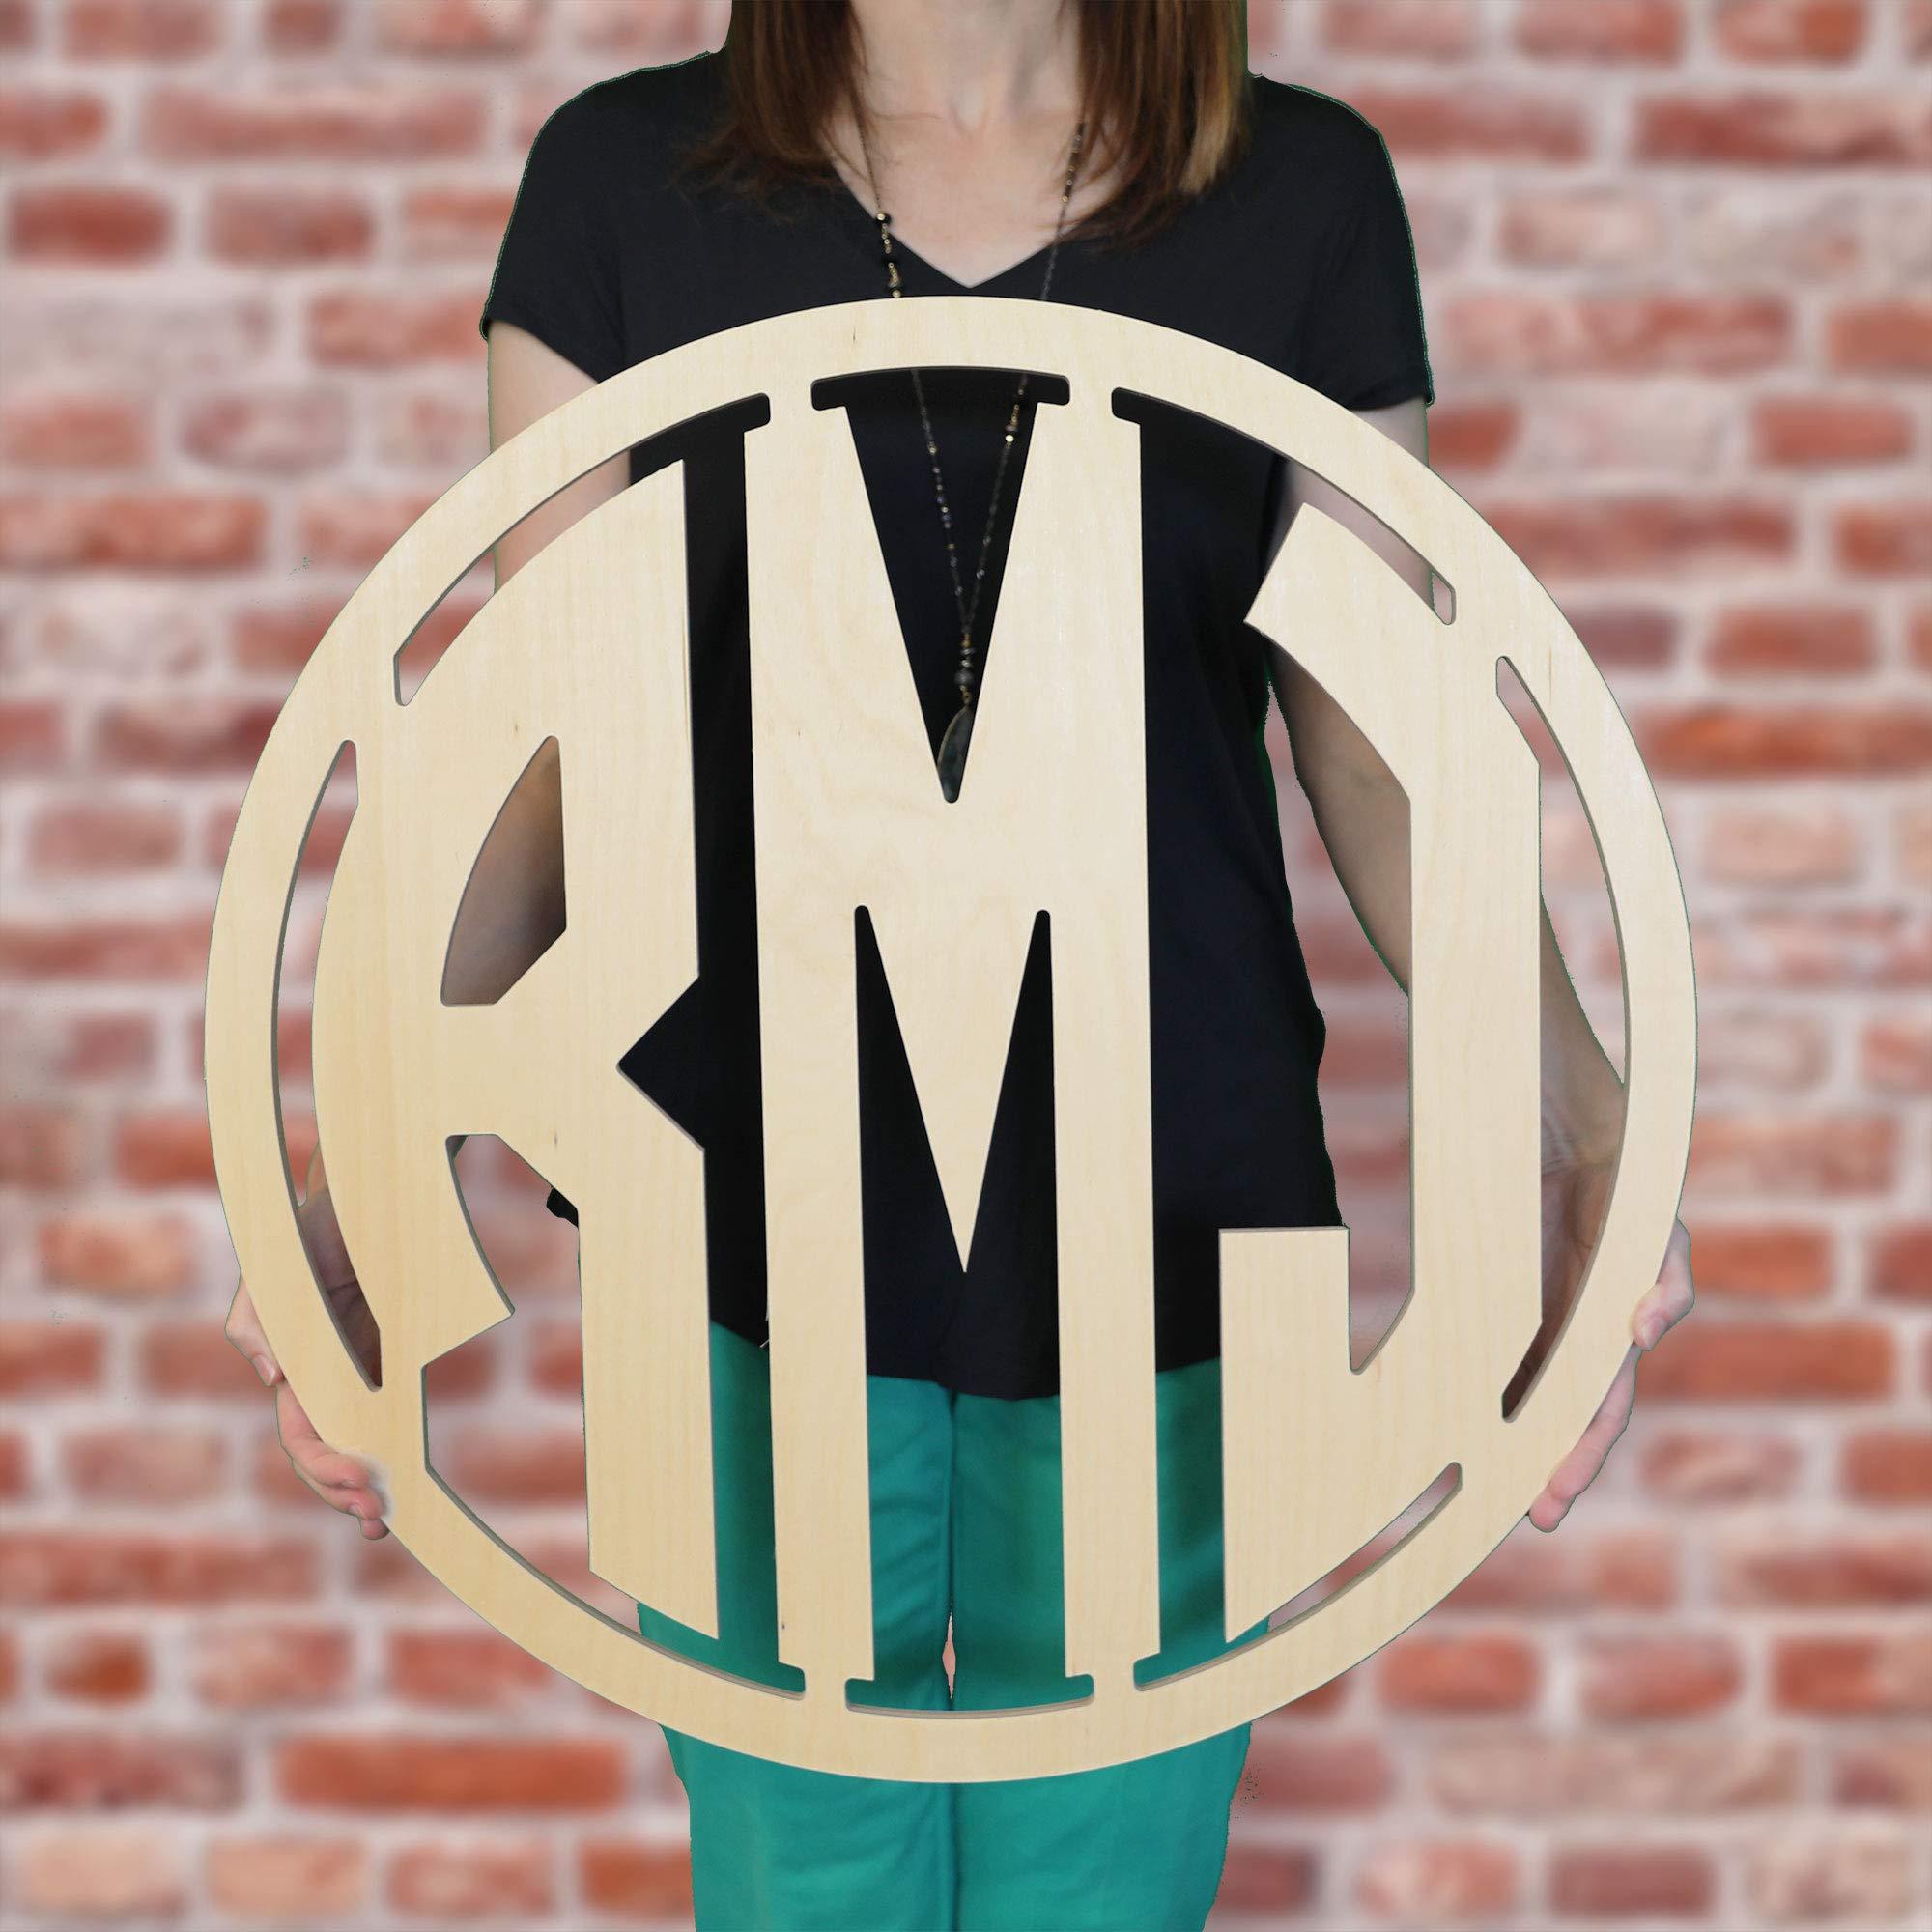 SALE 12-36 inch MODERN Wooden Monogram Letters Vine Room Decor Nursery Decor Wooden Monogram Wall Art Large Wood monogram wall hanging wood LARGE